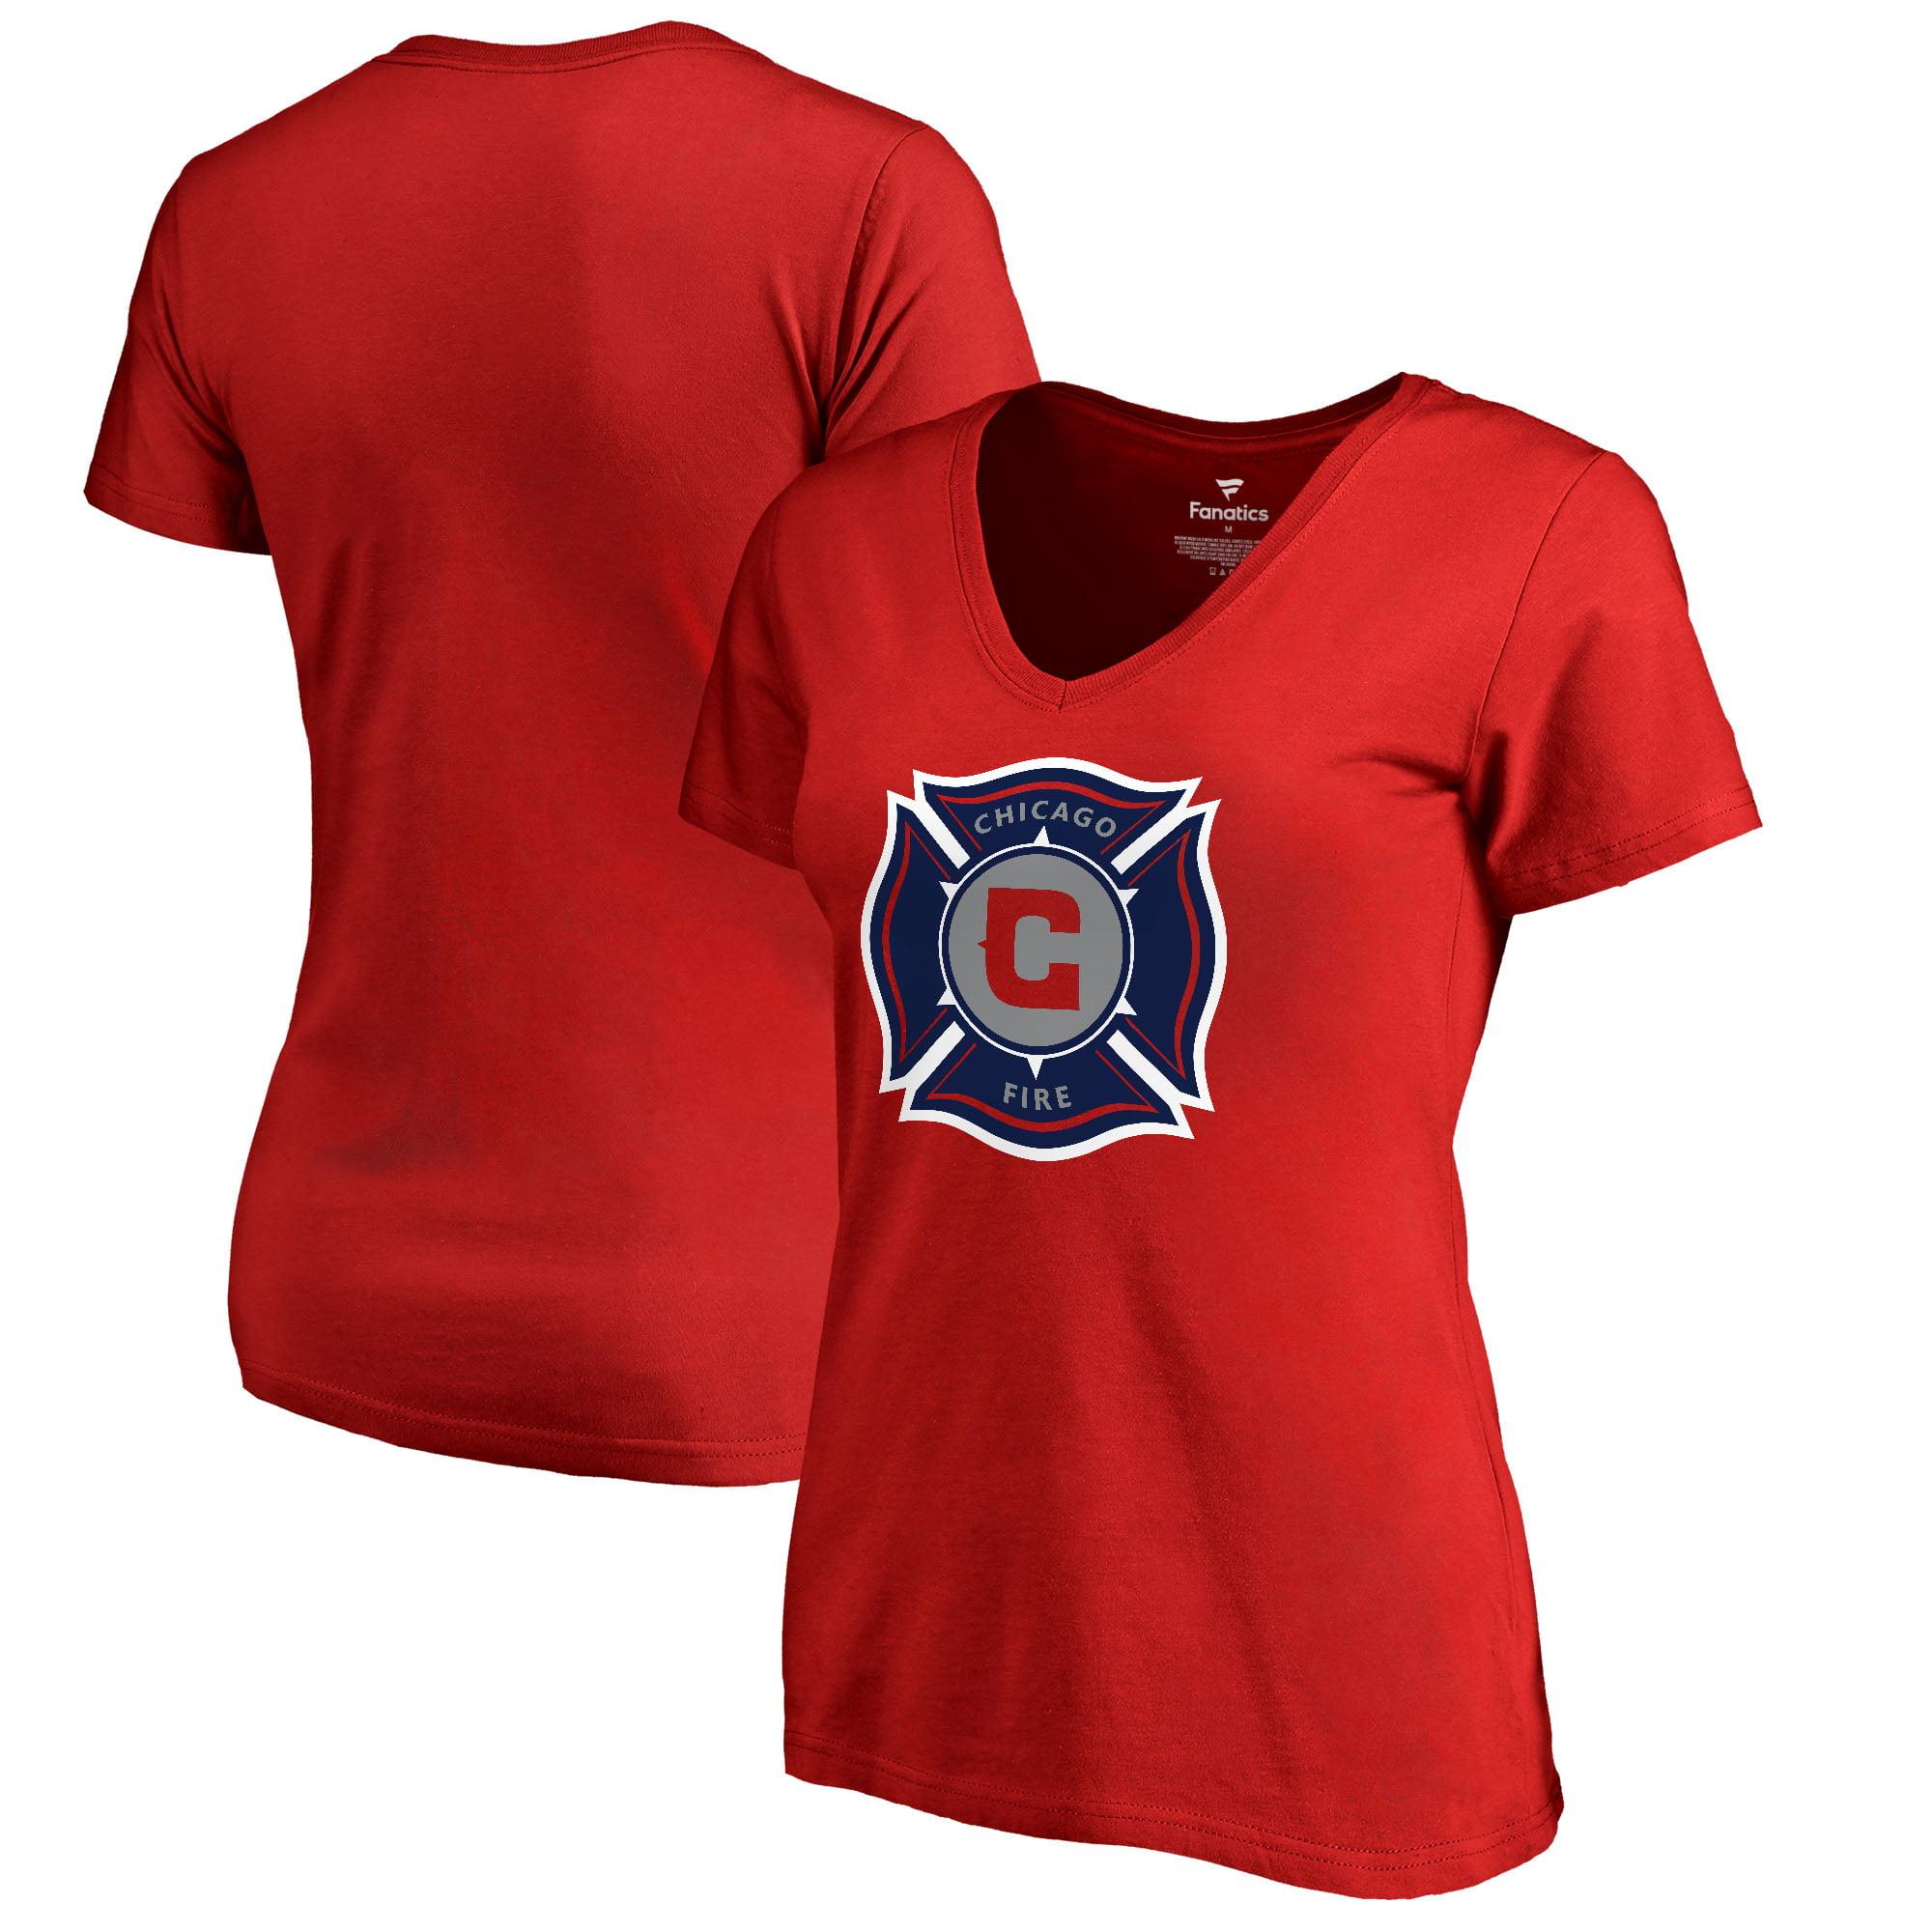 Chicago Fire Fanatics Branded Women's Primary Logo V-Neck T-Shirt - Red